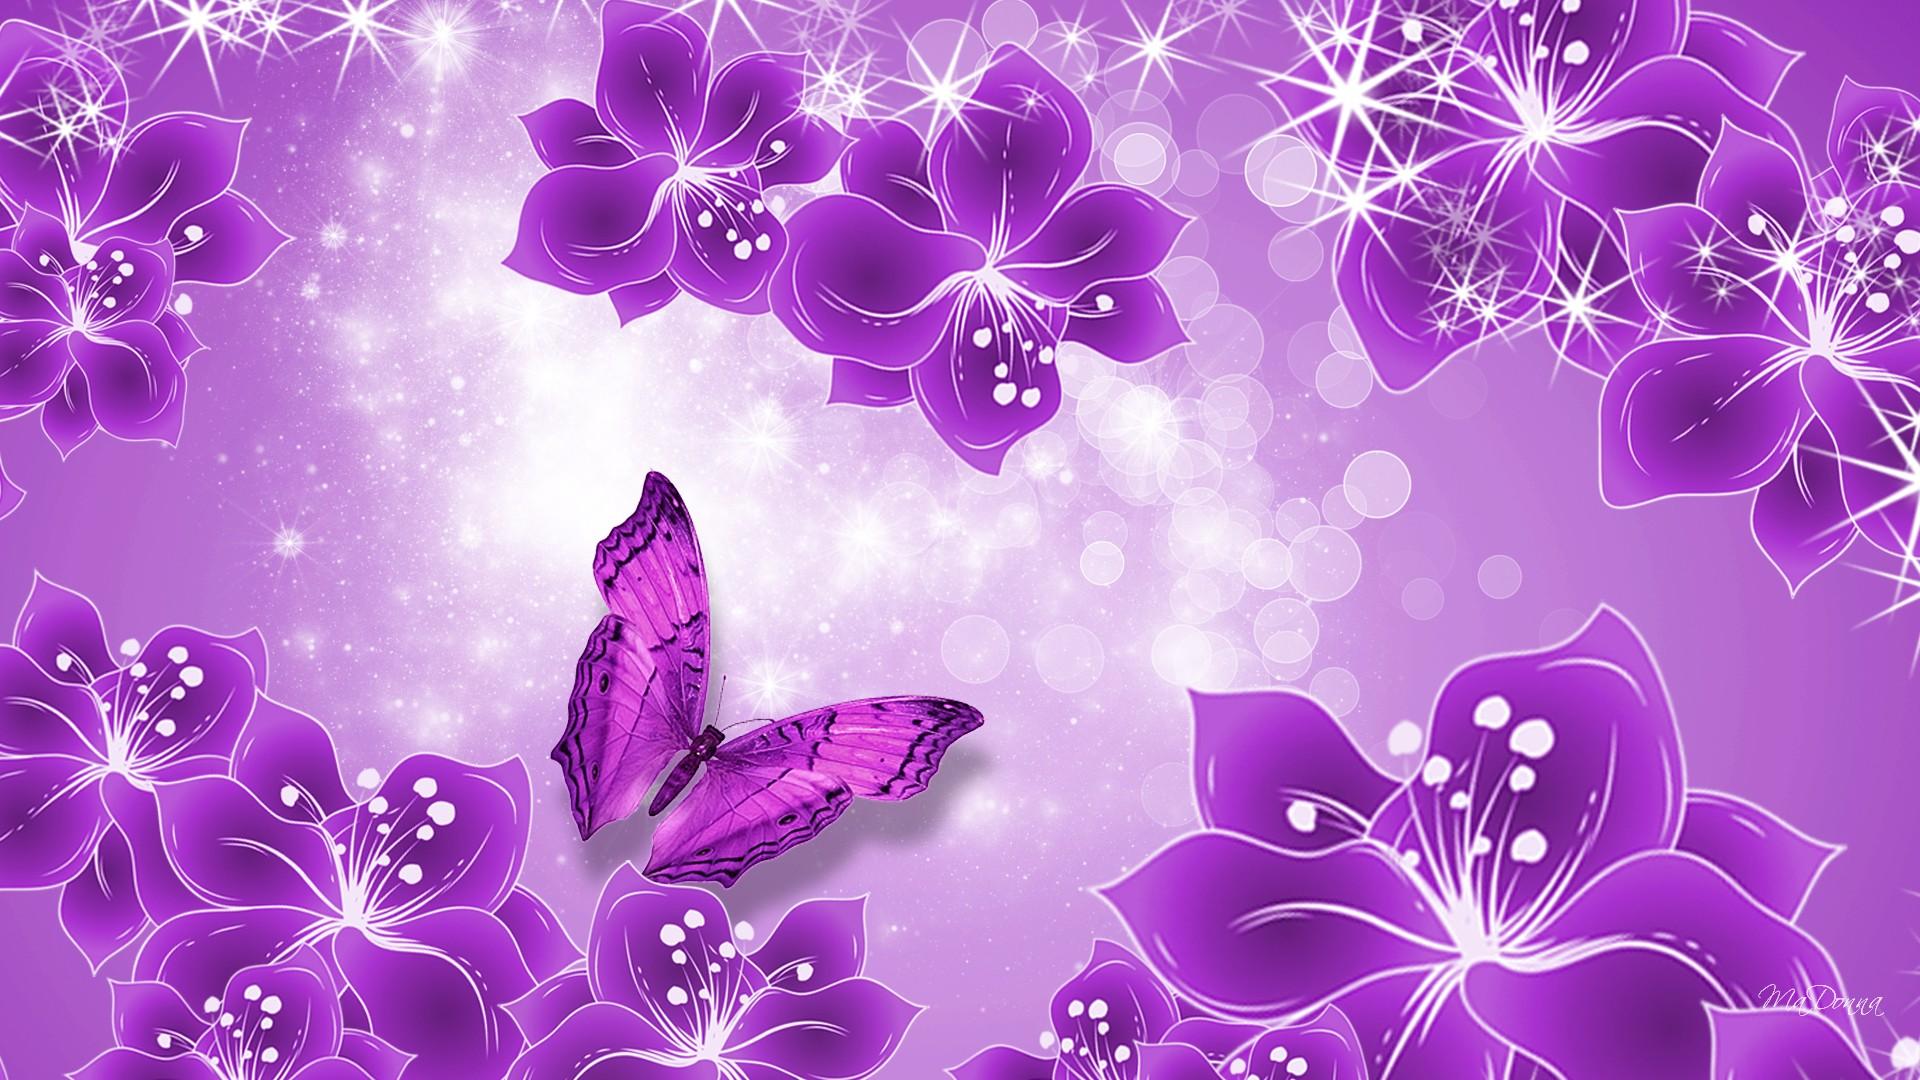 pink and purple butterfly wallpaper - wallpapersafari